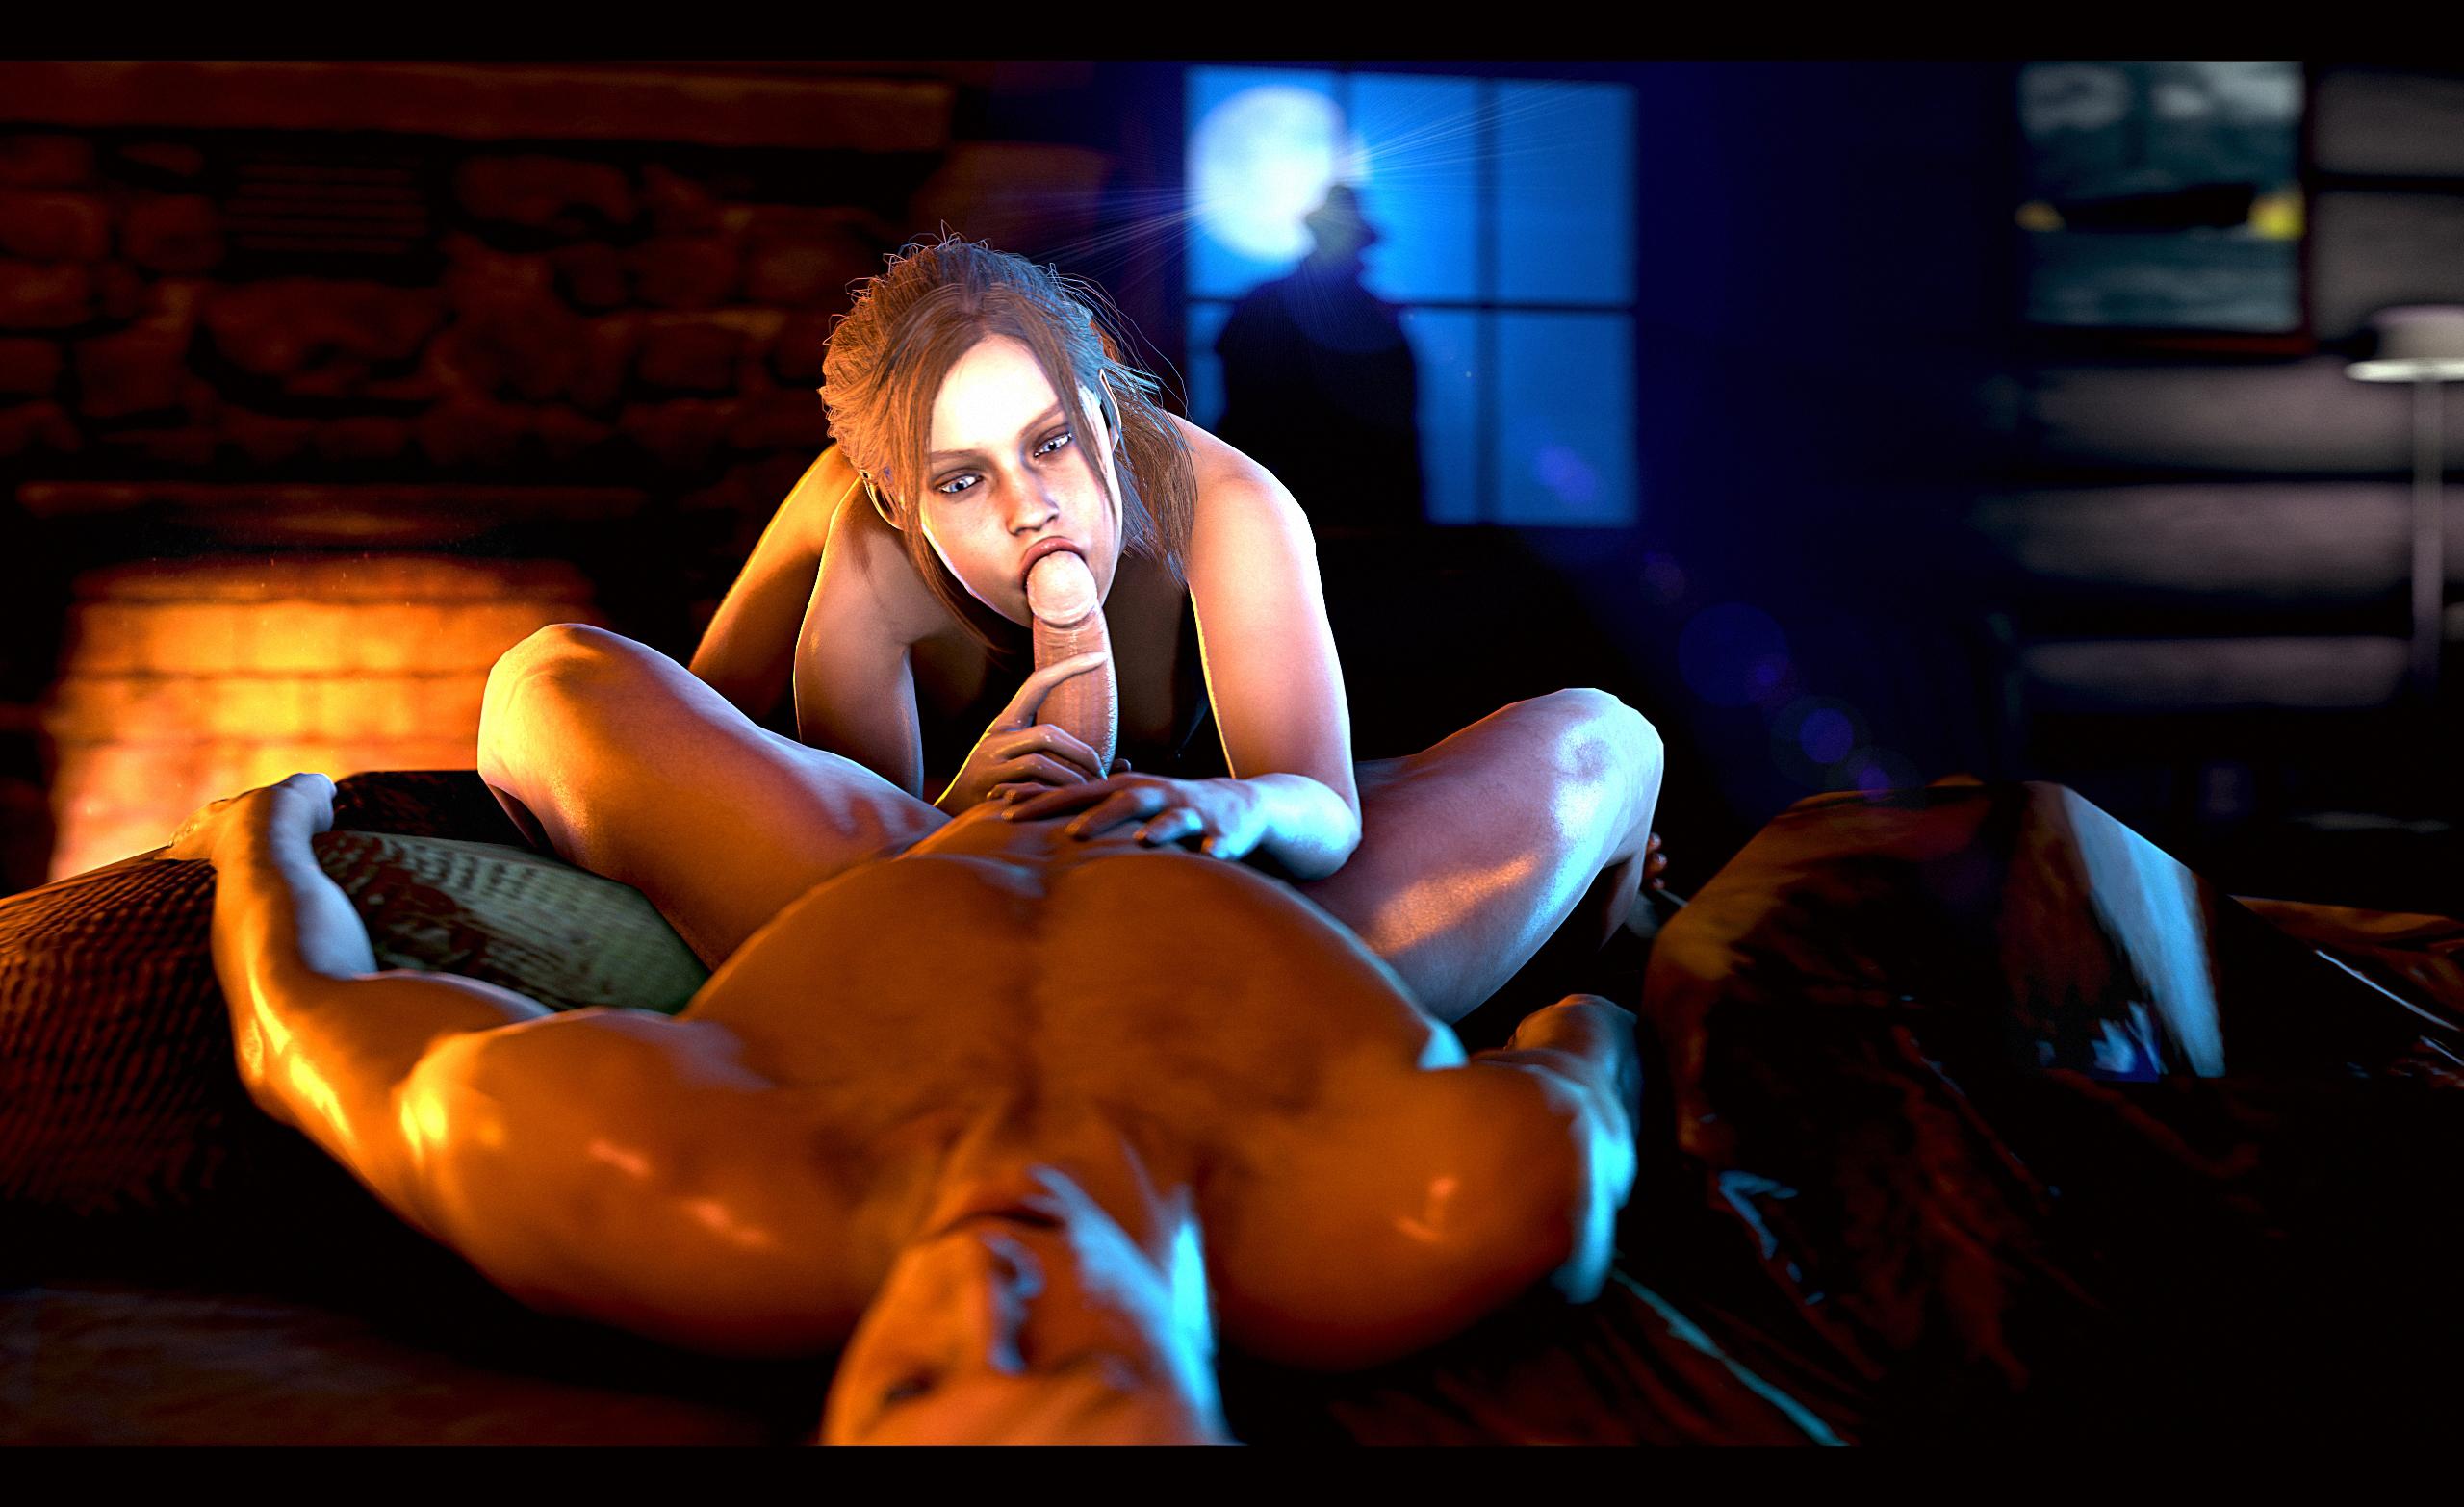 Barbellsfm Porn Torrent aco/ - adult cartoons » thread #3013427